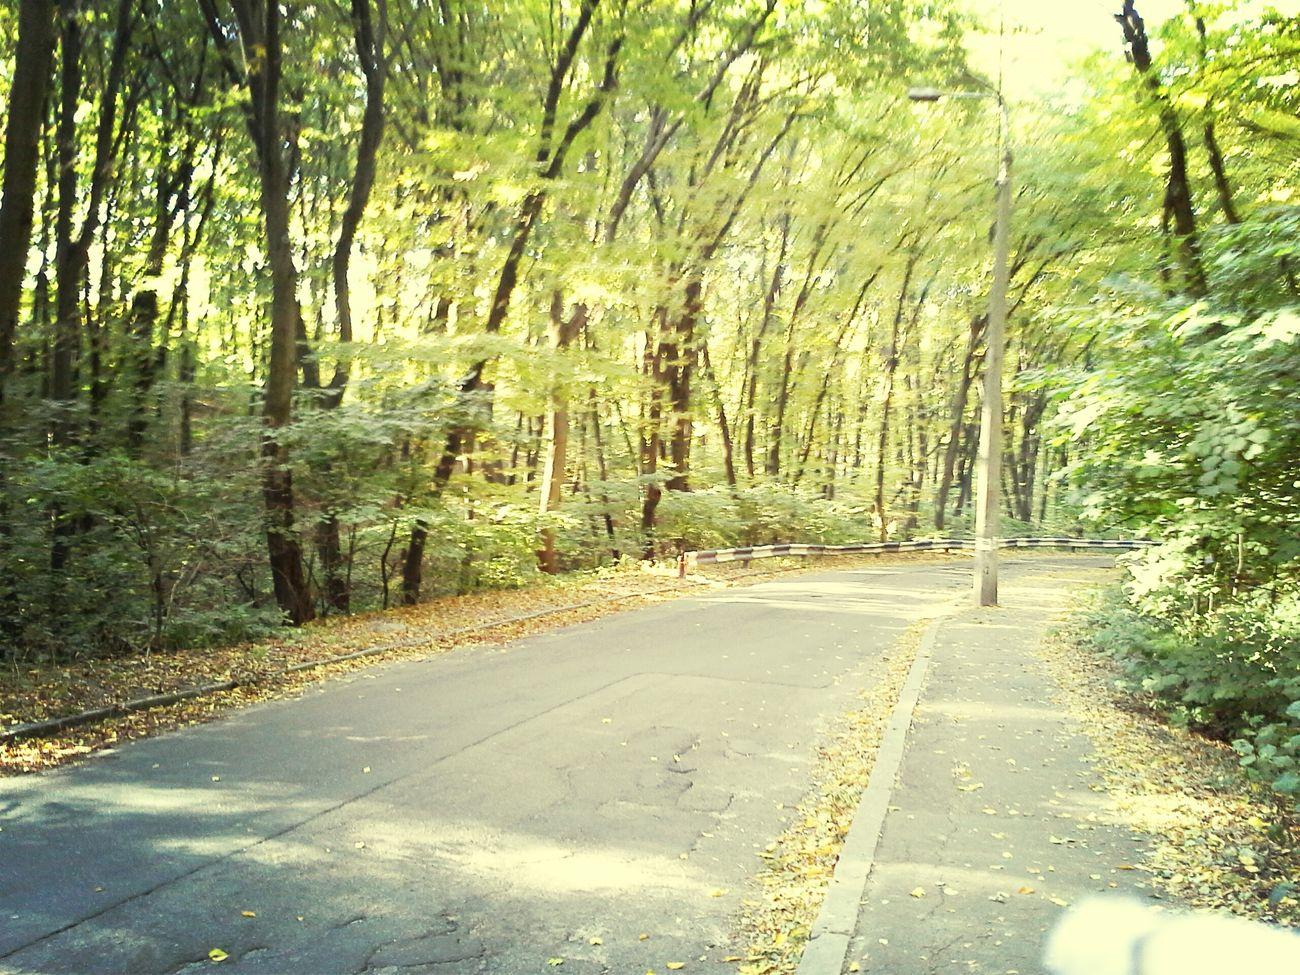 Morning road.